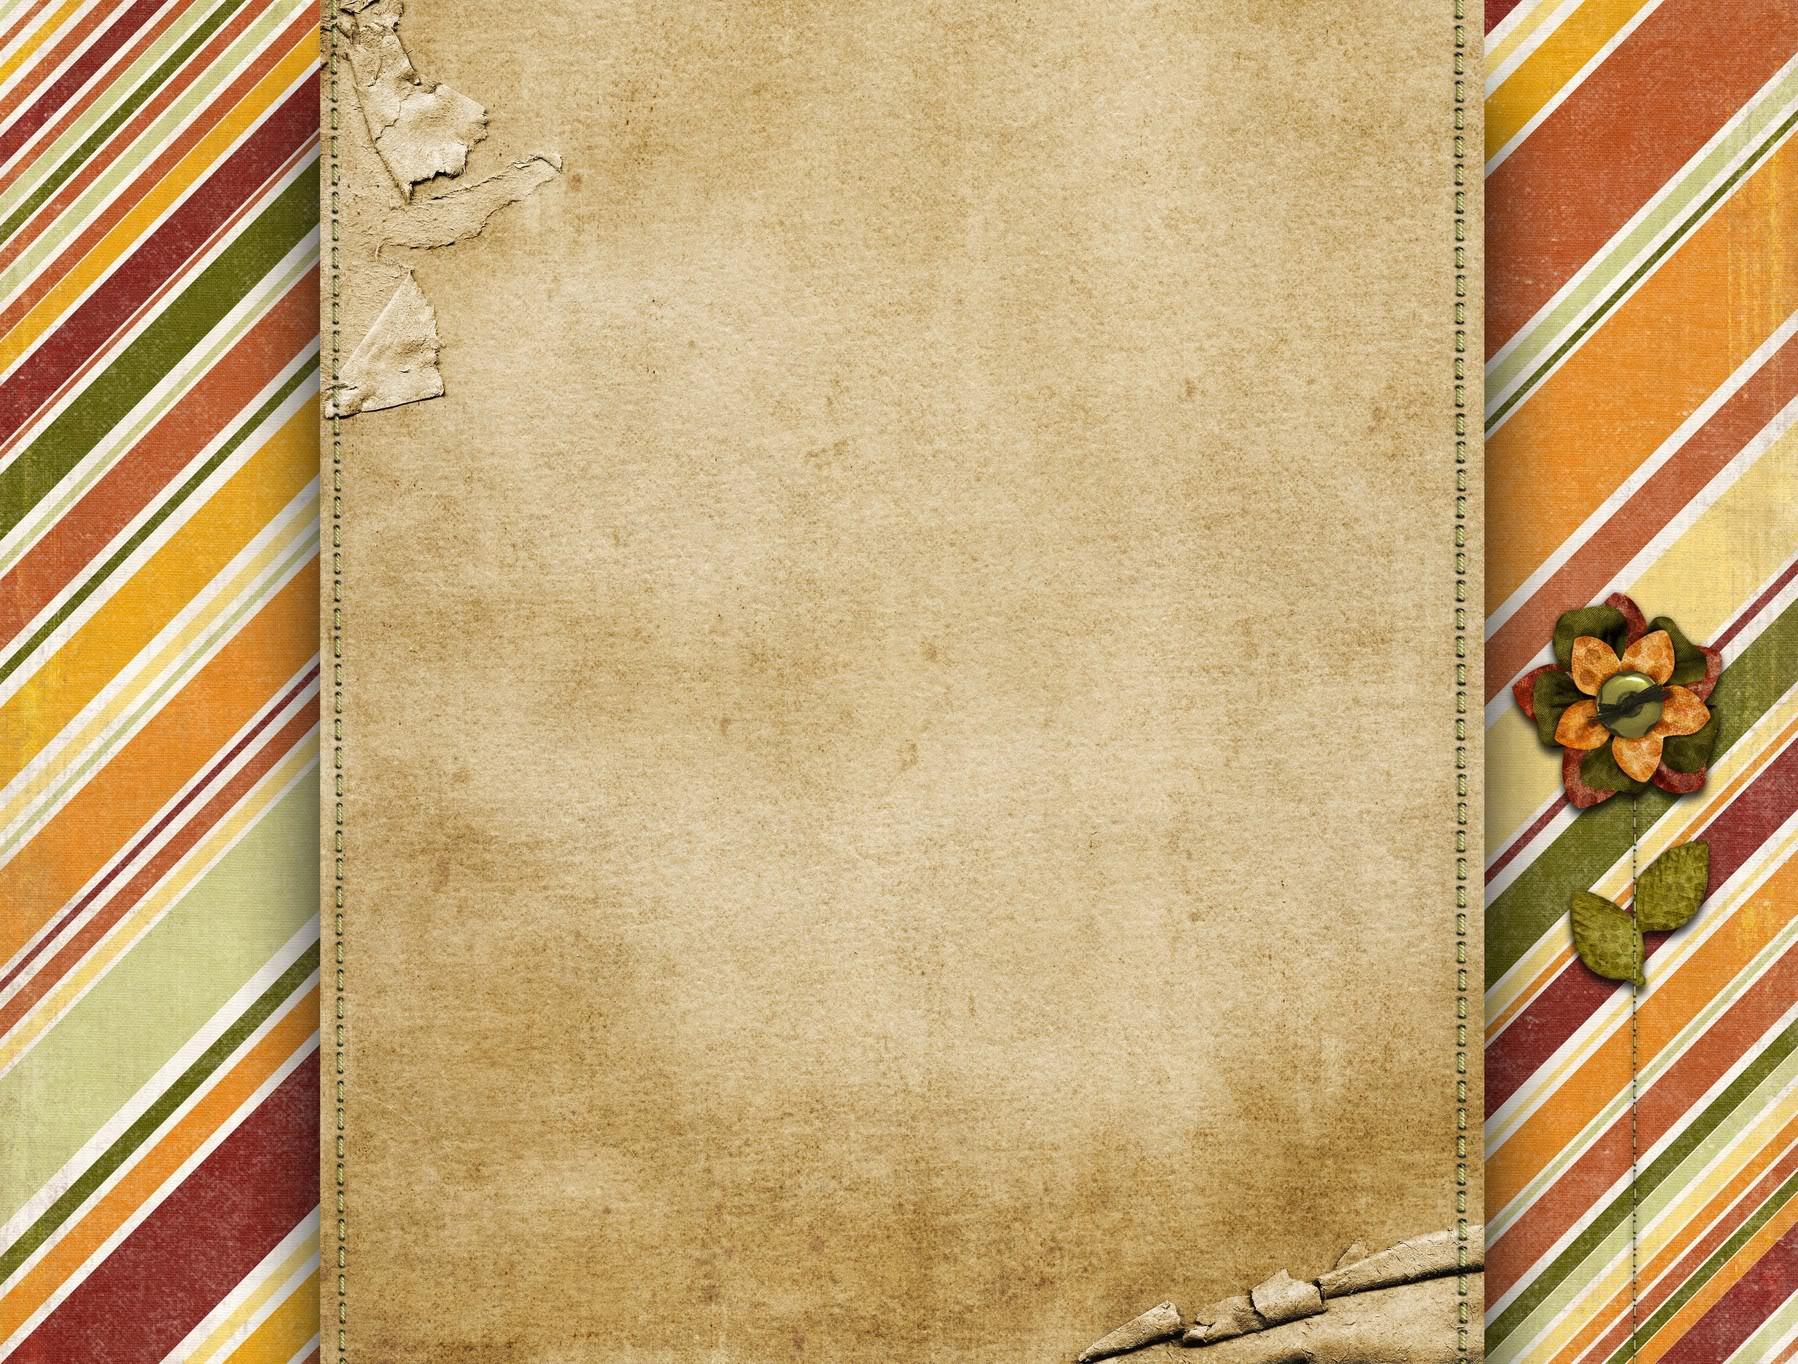 Images of Fall Borders wallpaper wallpaper hd background desktop 1798x1364